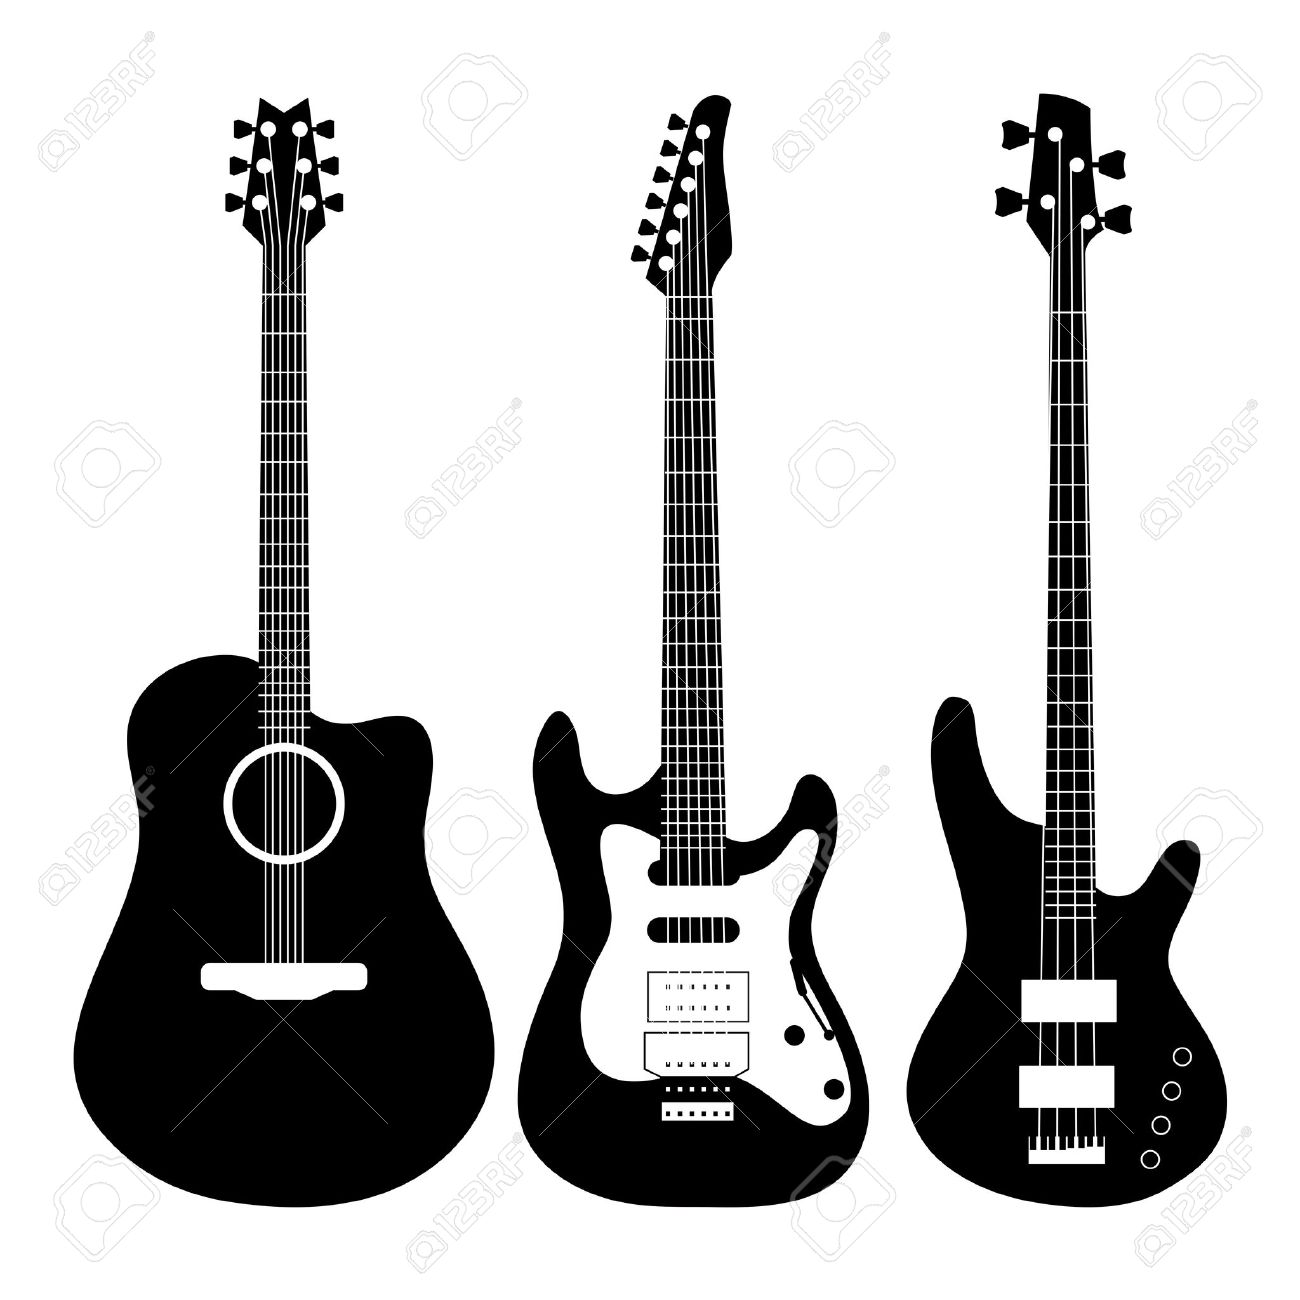 electric guitar vector royalty free cliparts vectors and stock rh 123rf com